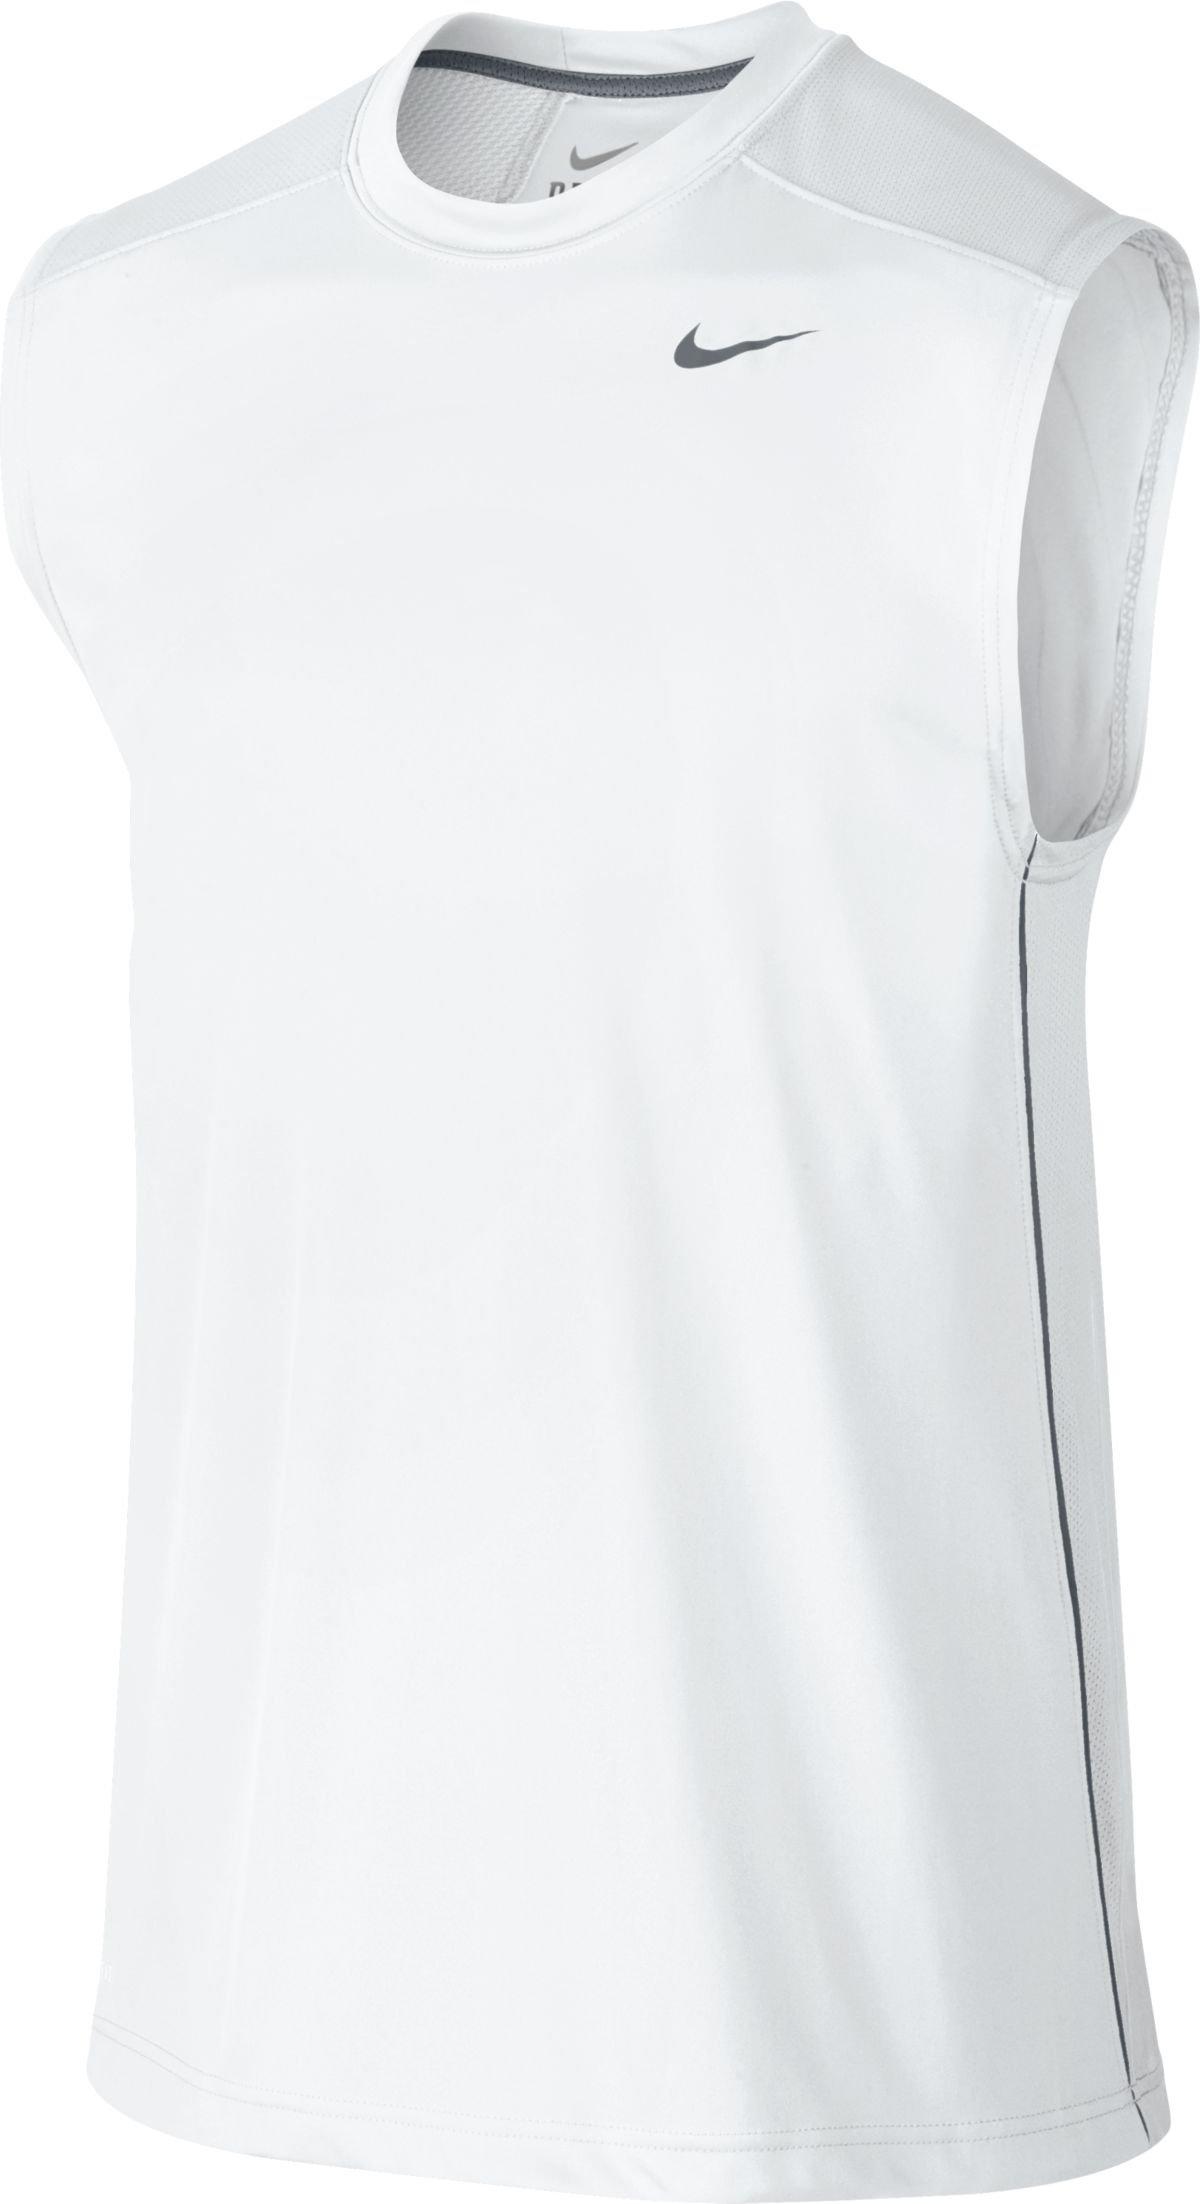 Tílko Nike LEGACY SL TOP